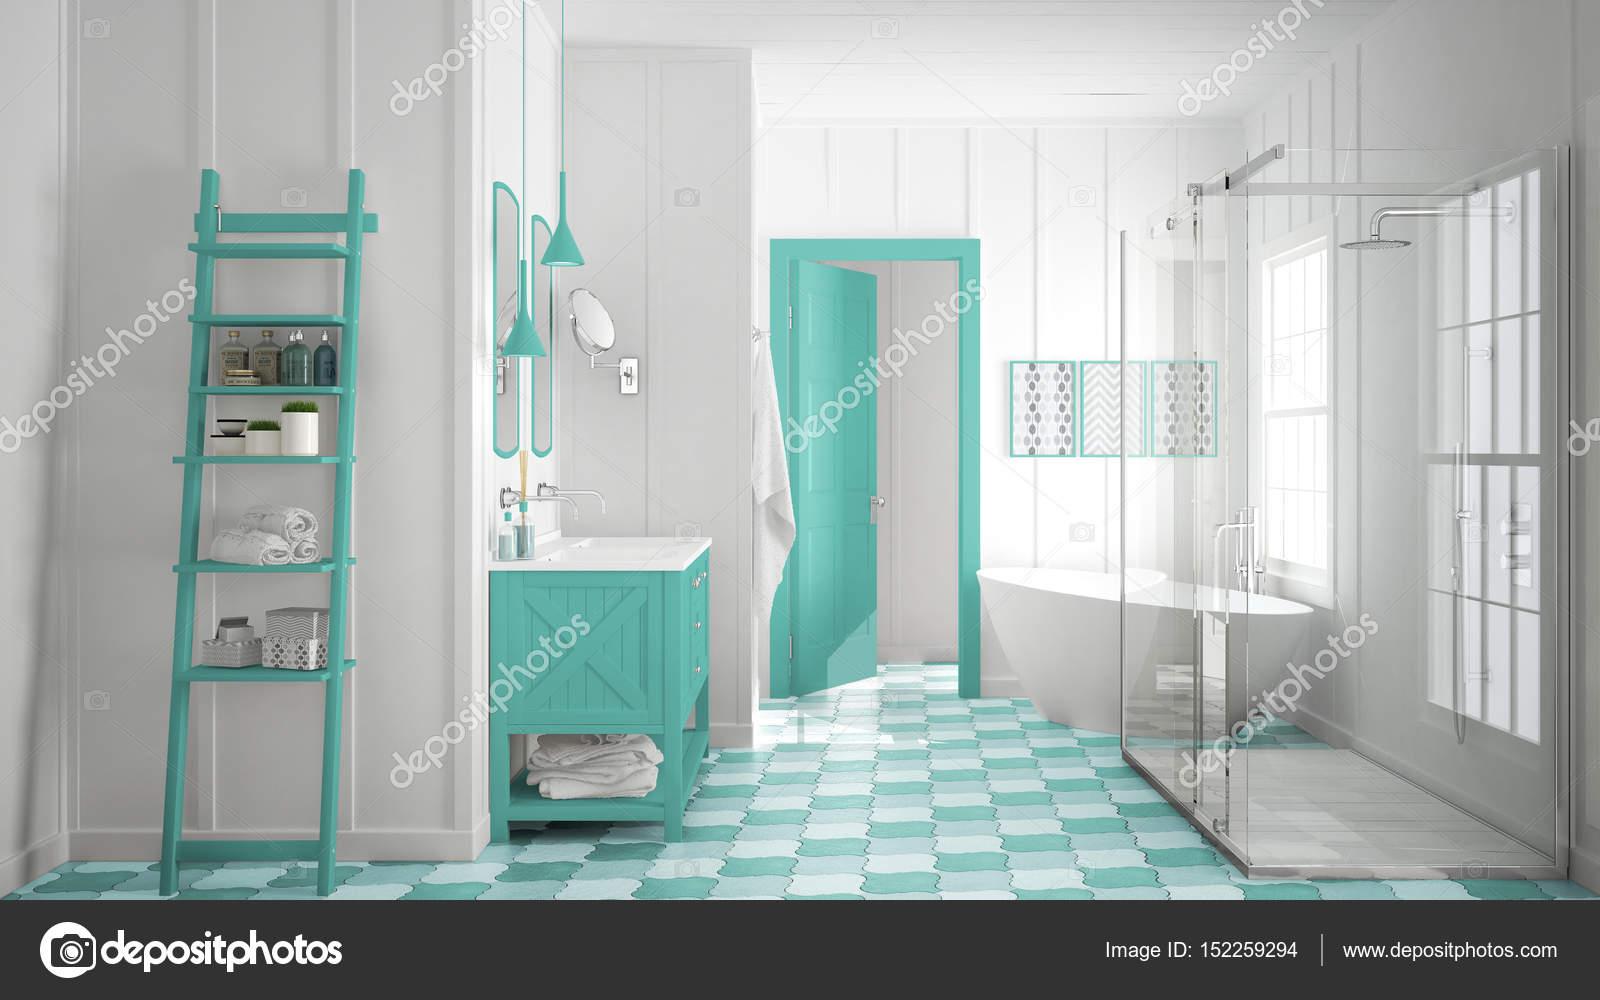 Scandinavian minimalist white and turquoise bathroom, shower, ba ...